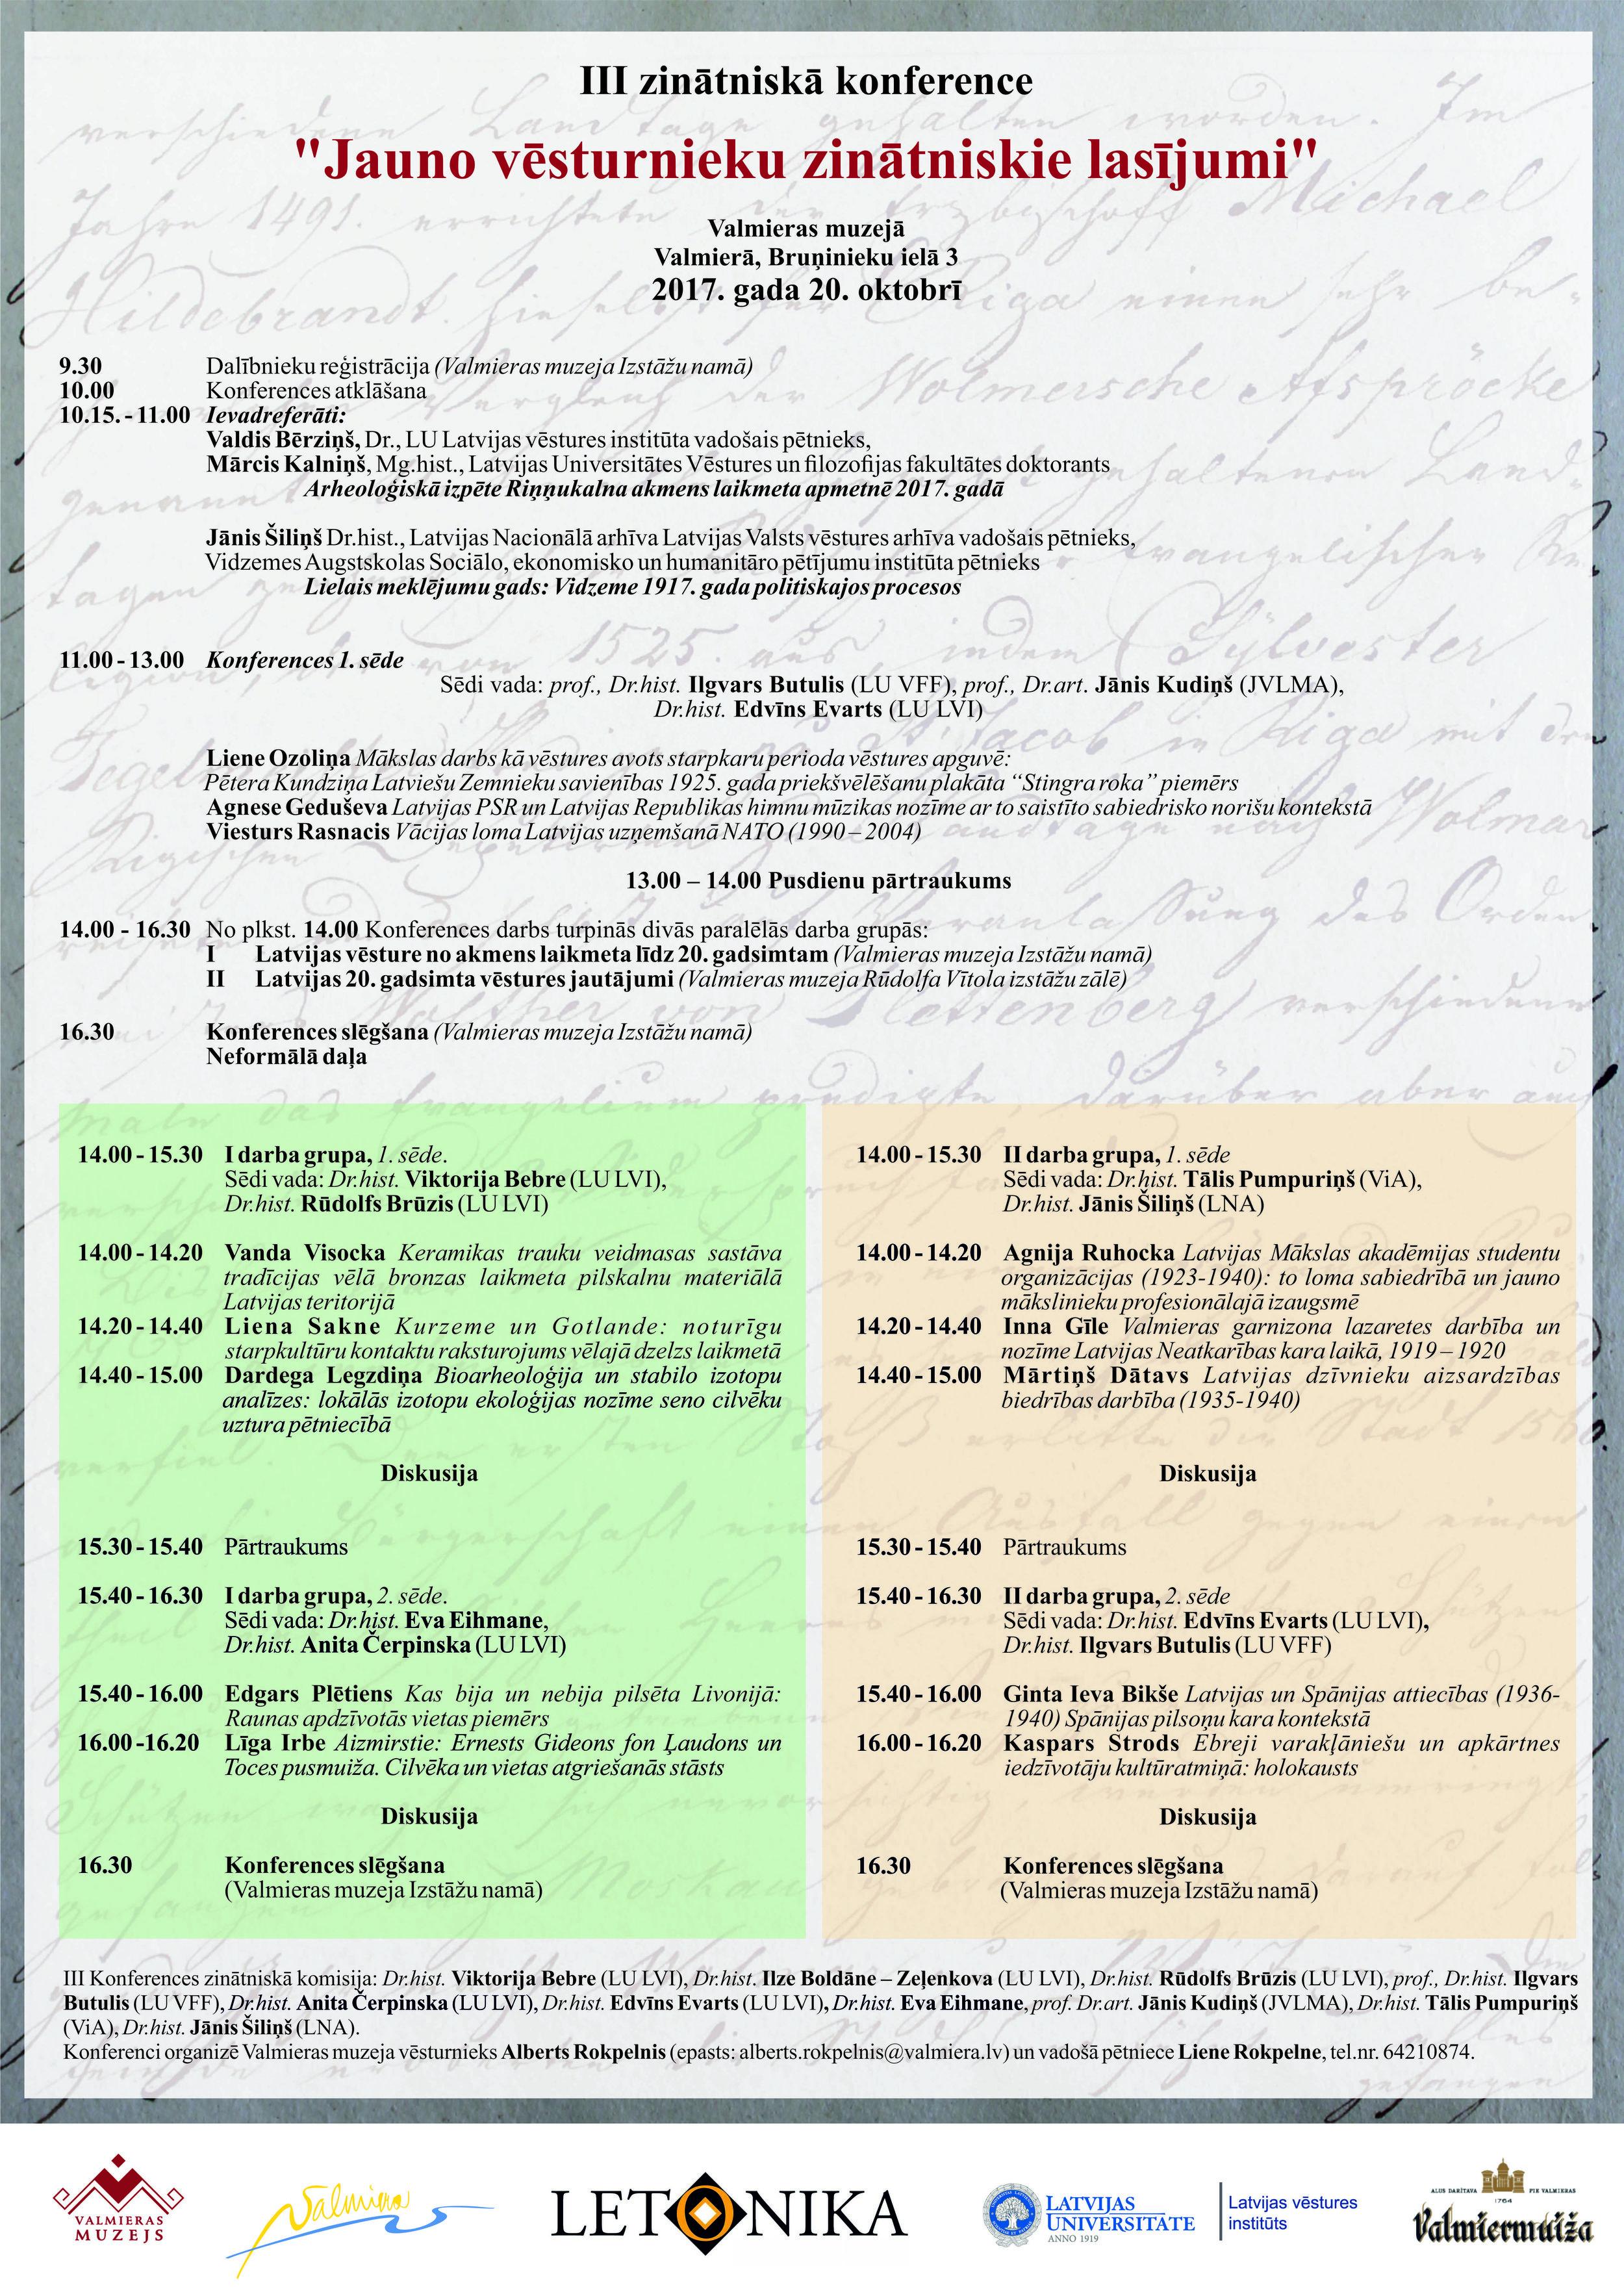 Konference_2017.jpg